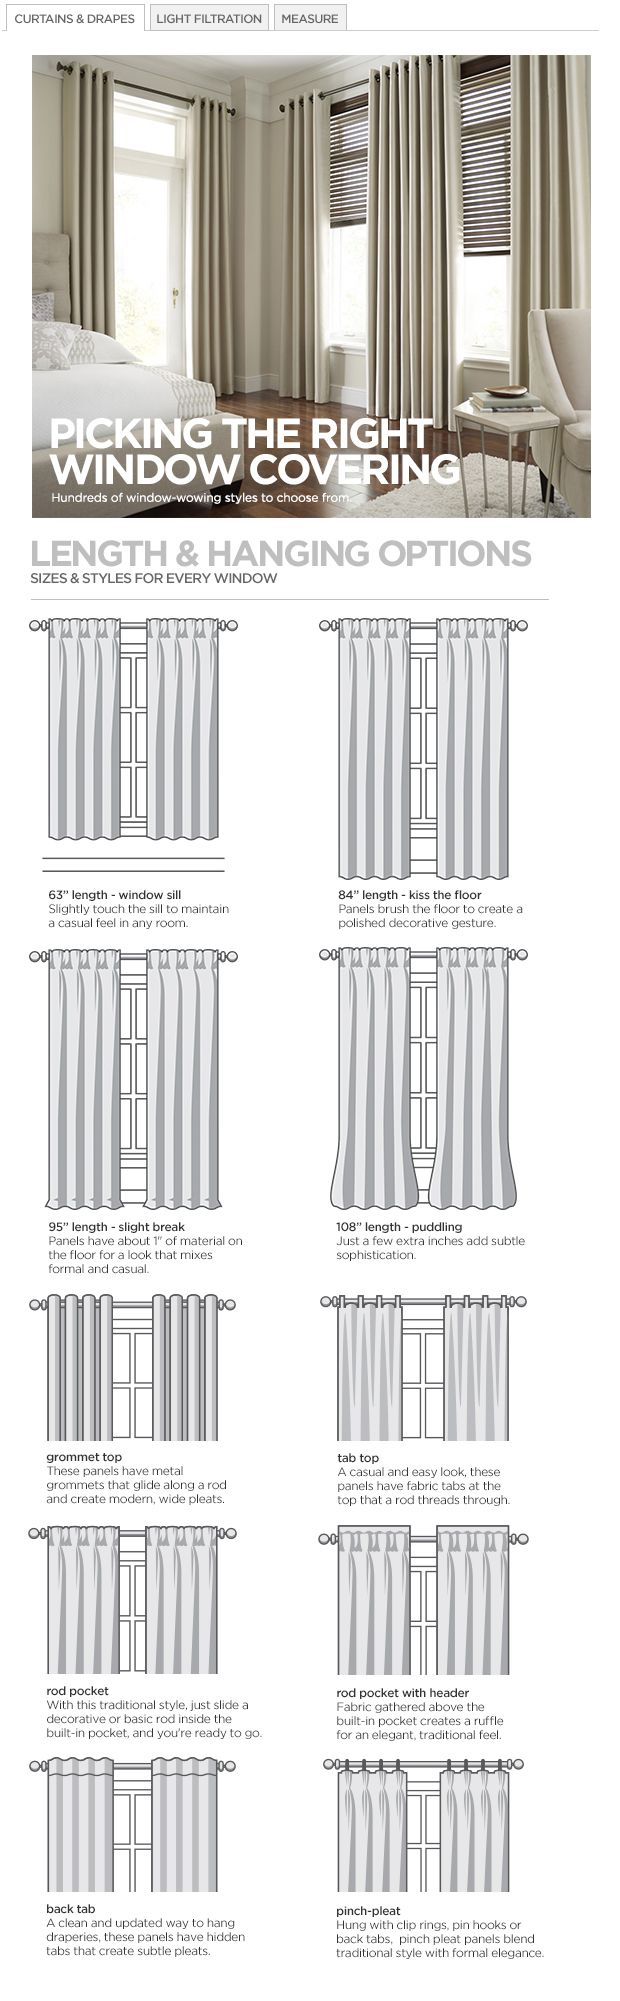 Royal Velvet 174 Supreme Pinch Pleat Back Tab Thermal Patio